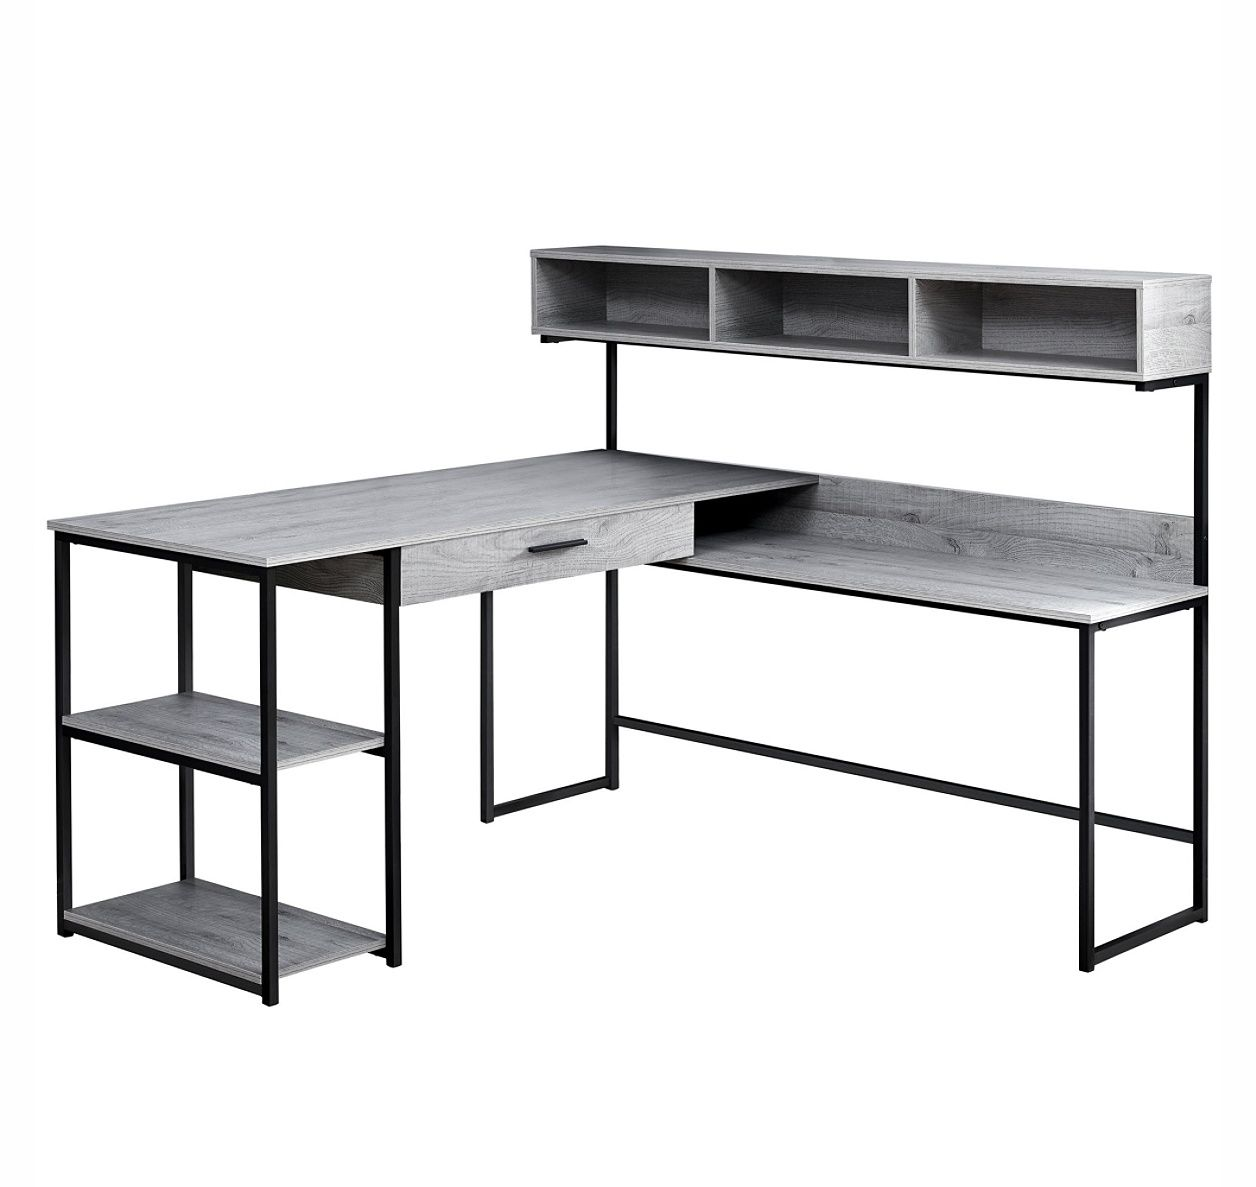 Monarch Specialties Corner Workstation Computer Desk Grayblack By Office Depot Officemax Corner Workstation Computer Desk Grey Corner Computer Desk